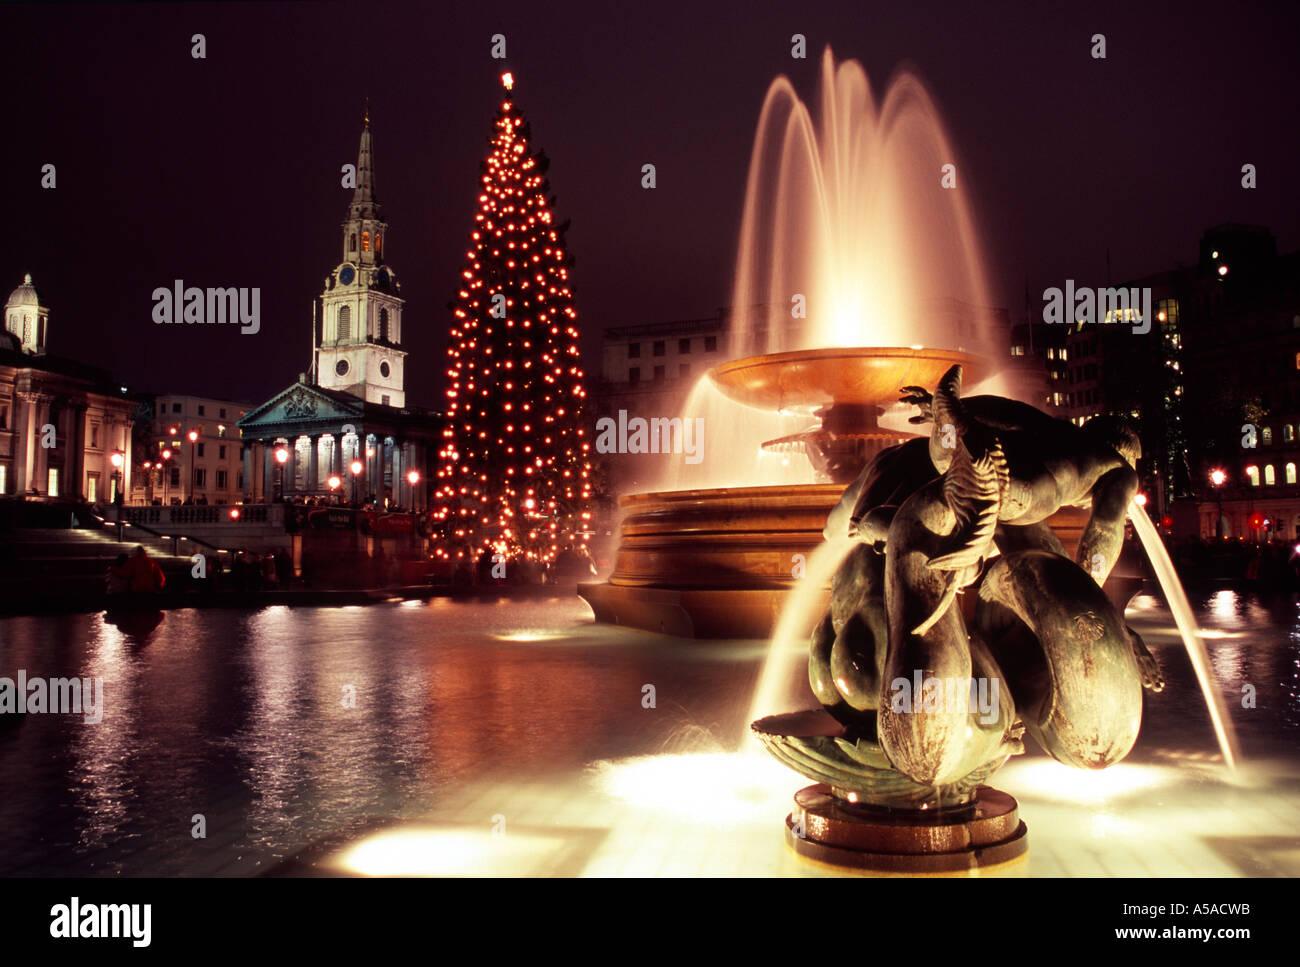 Norwegian Christmas Lights Stock Photos & Norwegian Christmas Lights ...